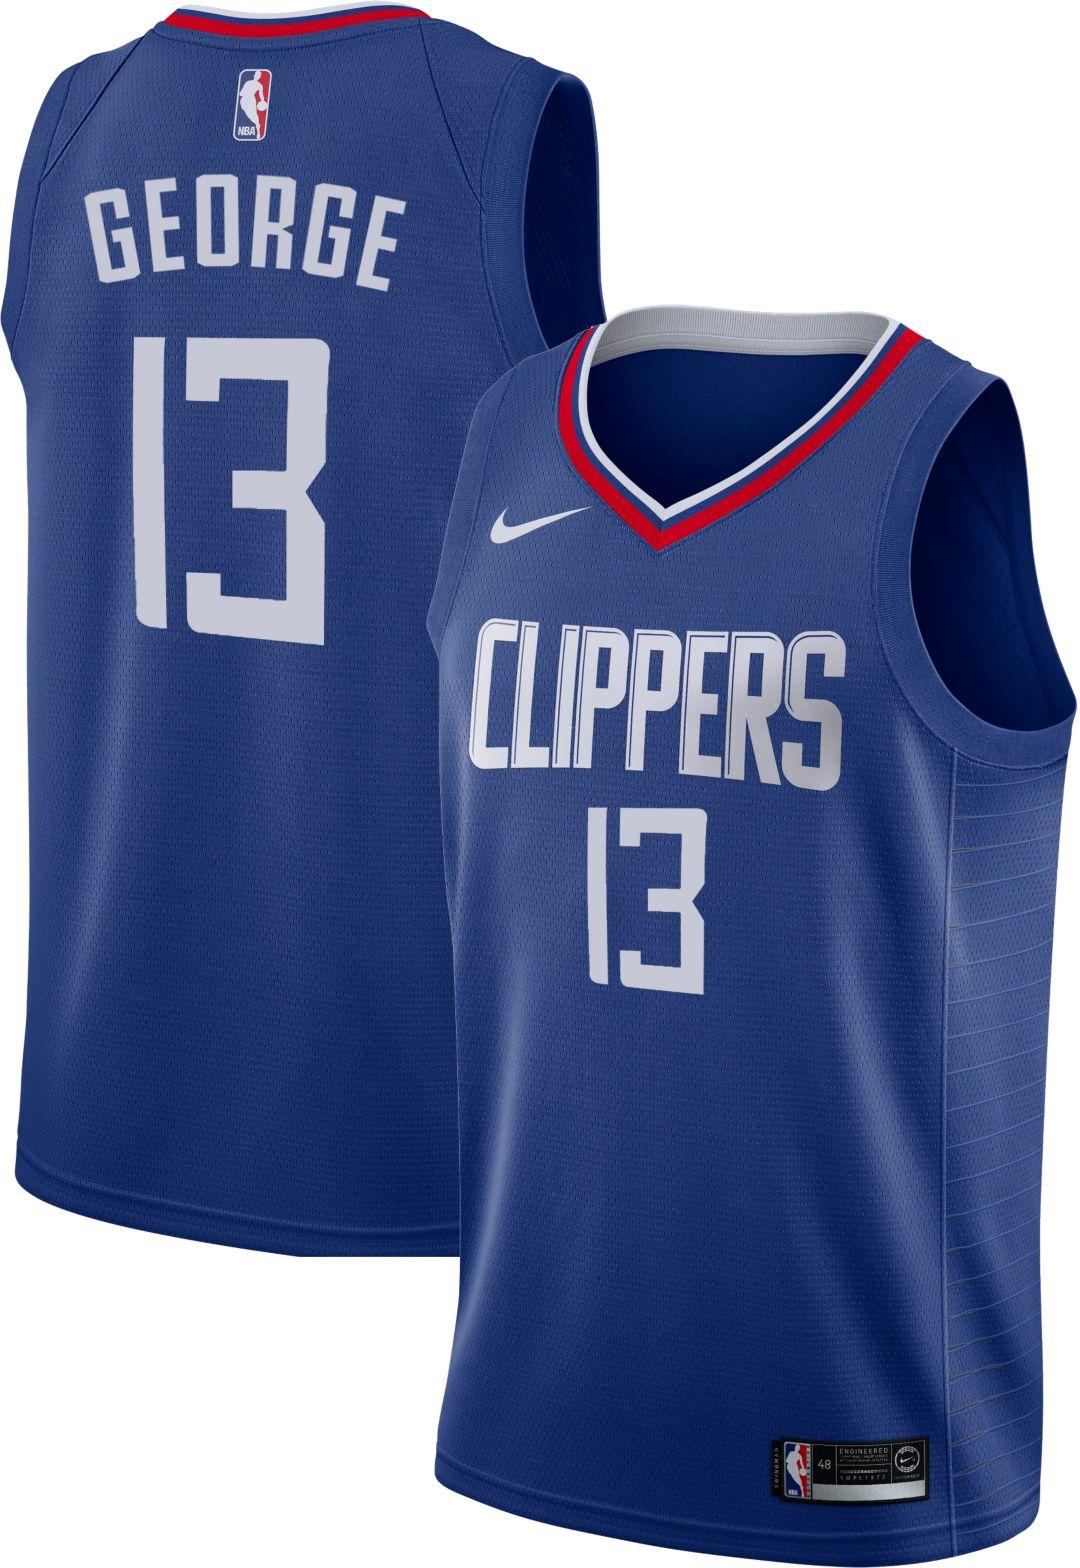 finest selection e344e 5a7de Nike Men's Los Angeles Clippers Paul George #13 Royal Dri-FIT Swingman  Jersey